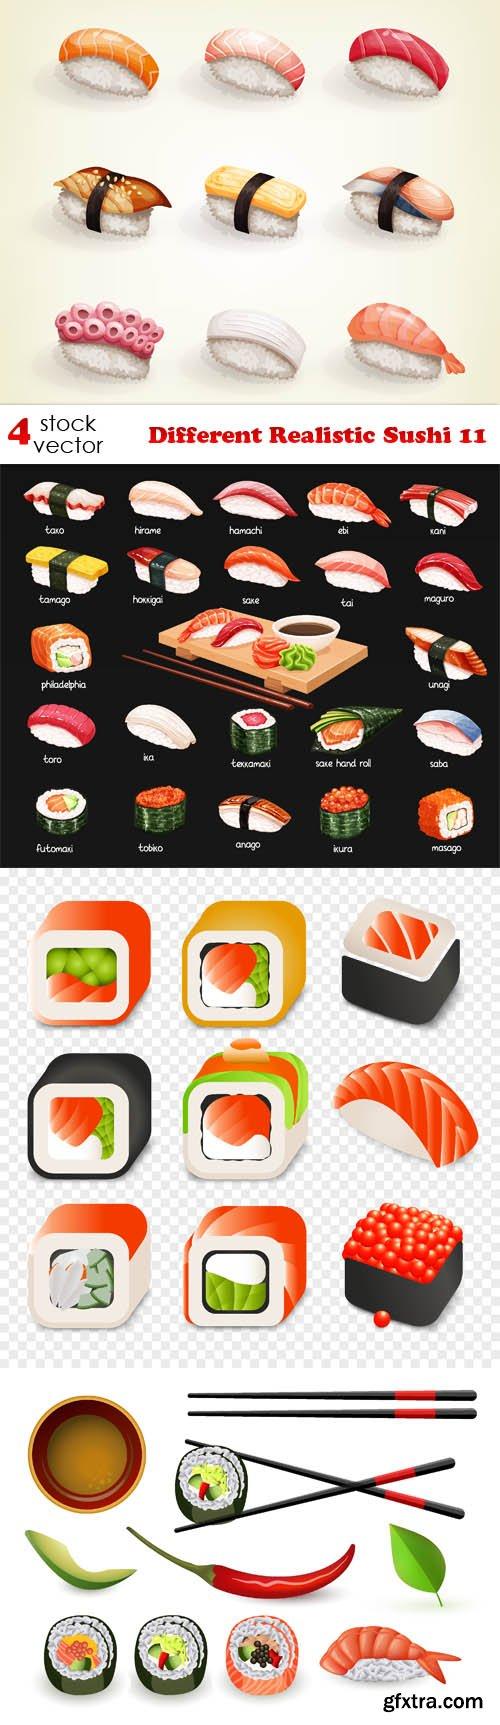 Vectors - Different Realistic Sushi 11